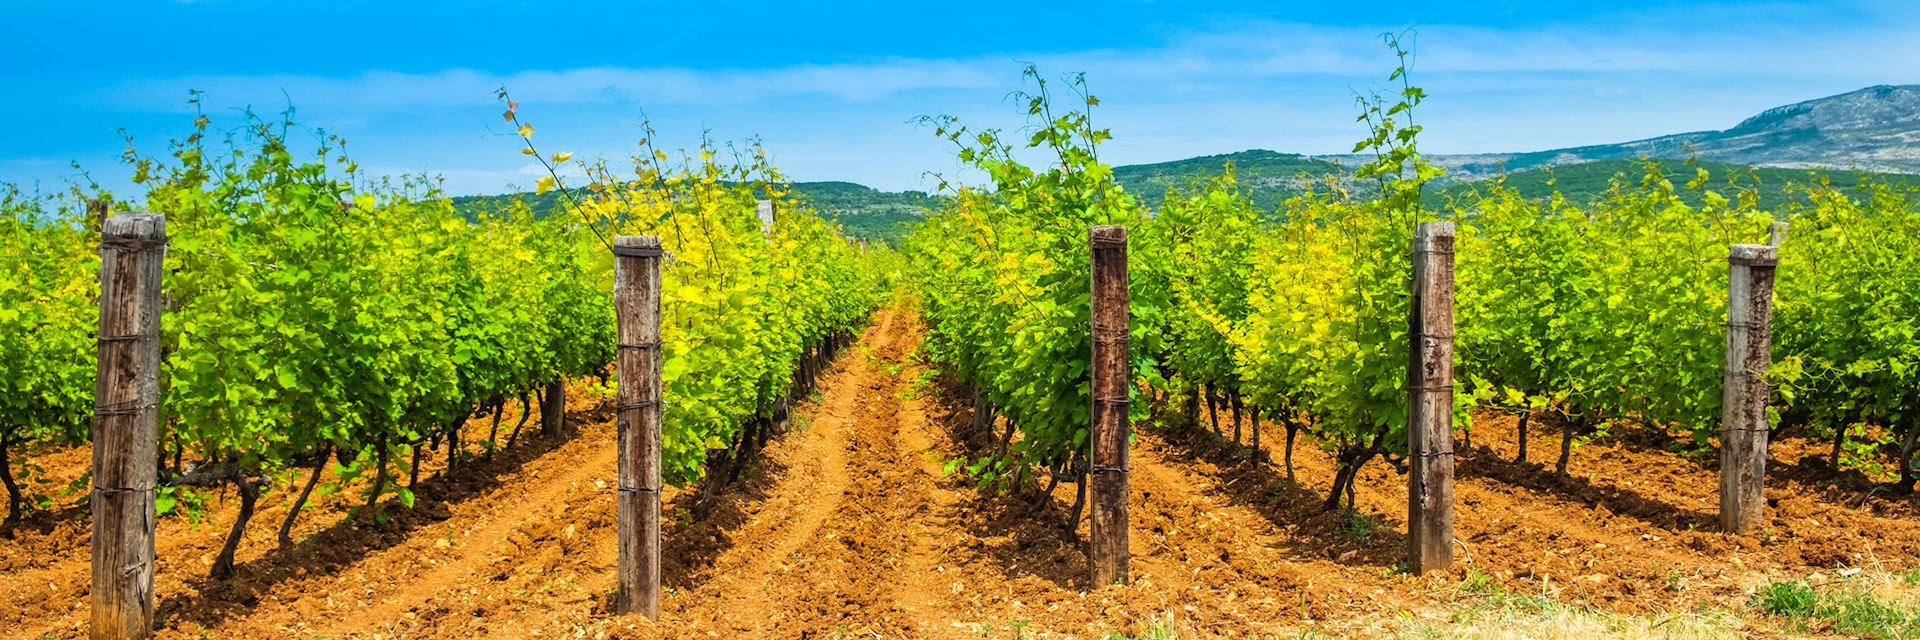 Vineyard on Dalmation coast